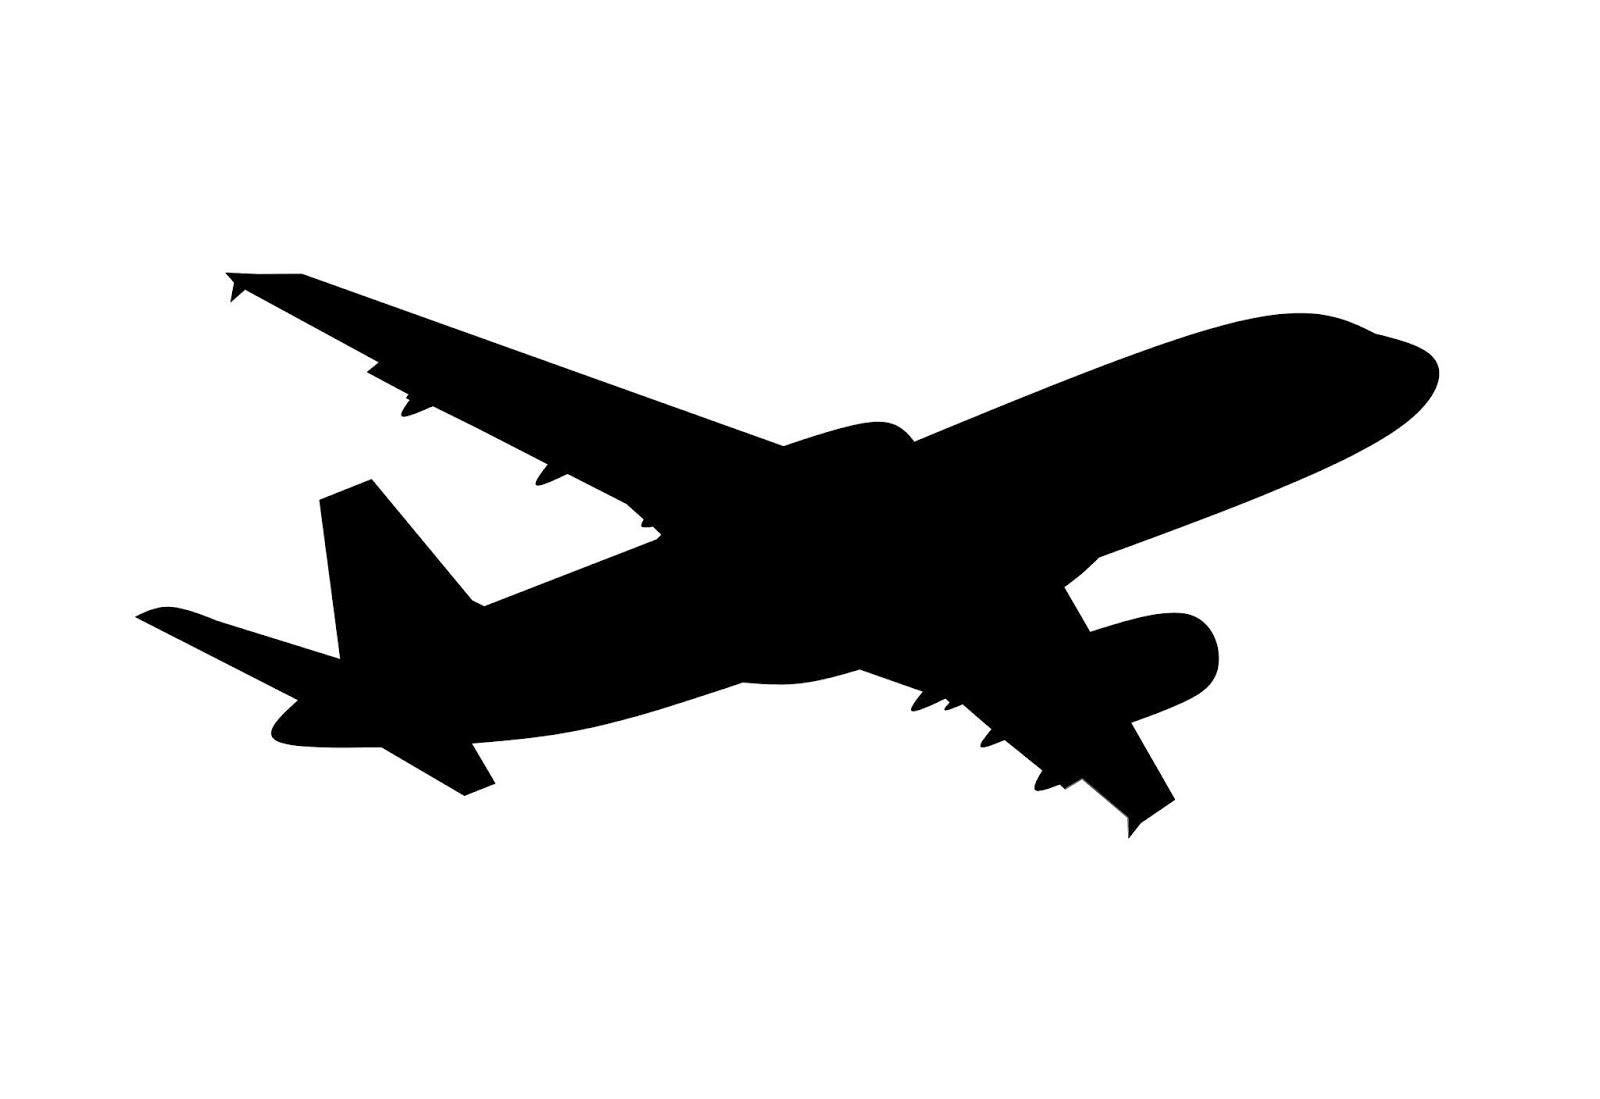 jumbo jet, airplane, aeroplane, vehicle, transportation, travel, vacation, fly, flight, silhouette